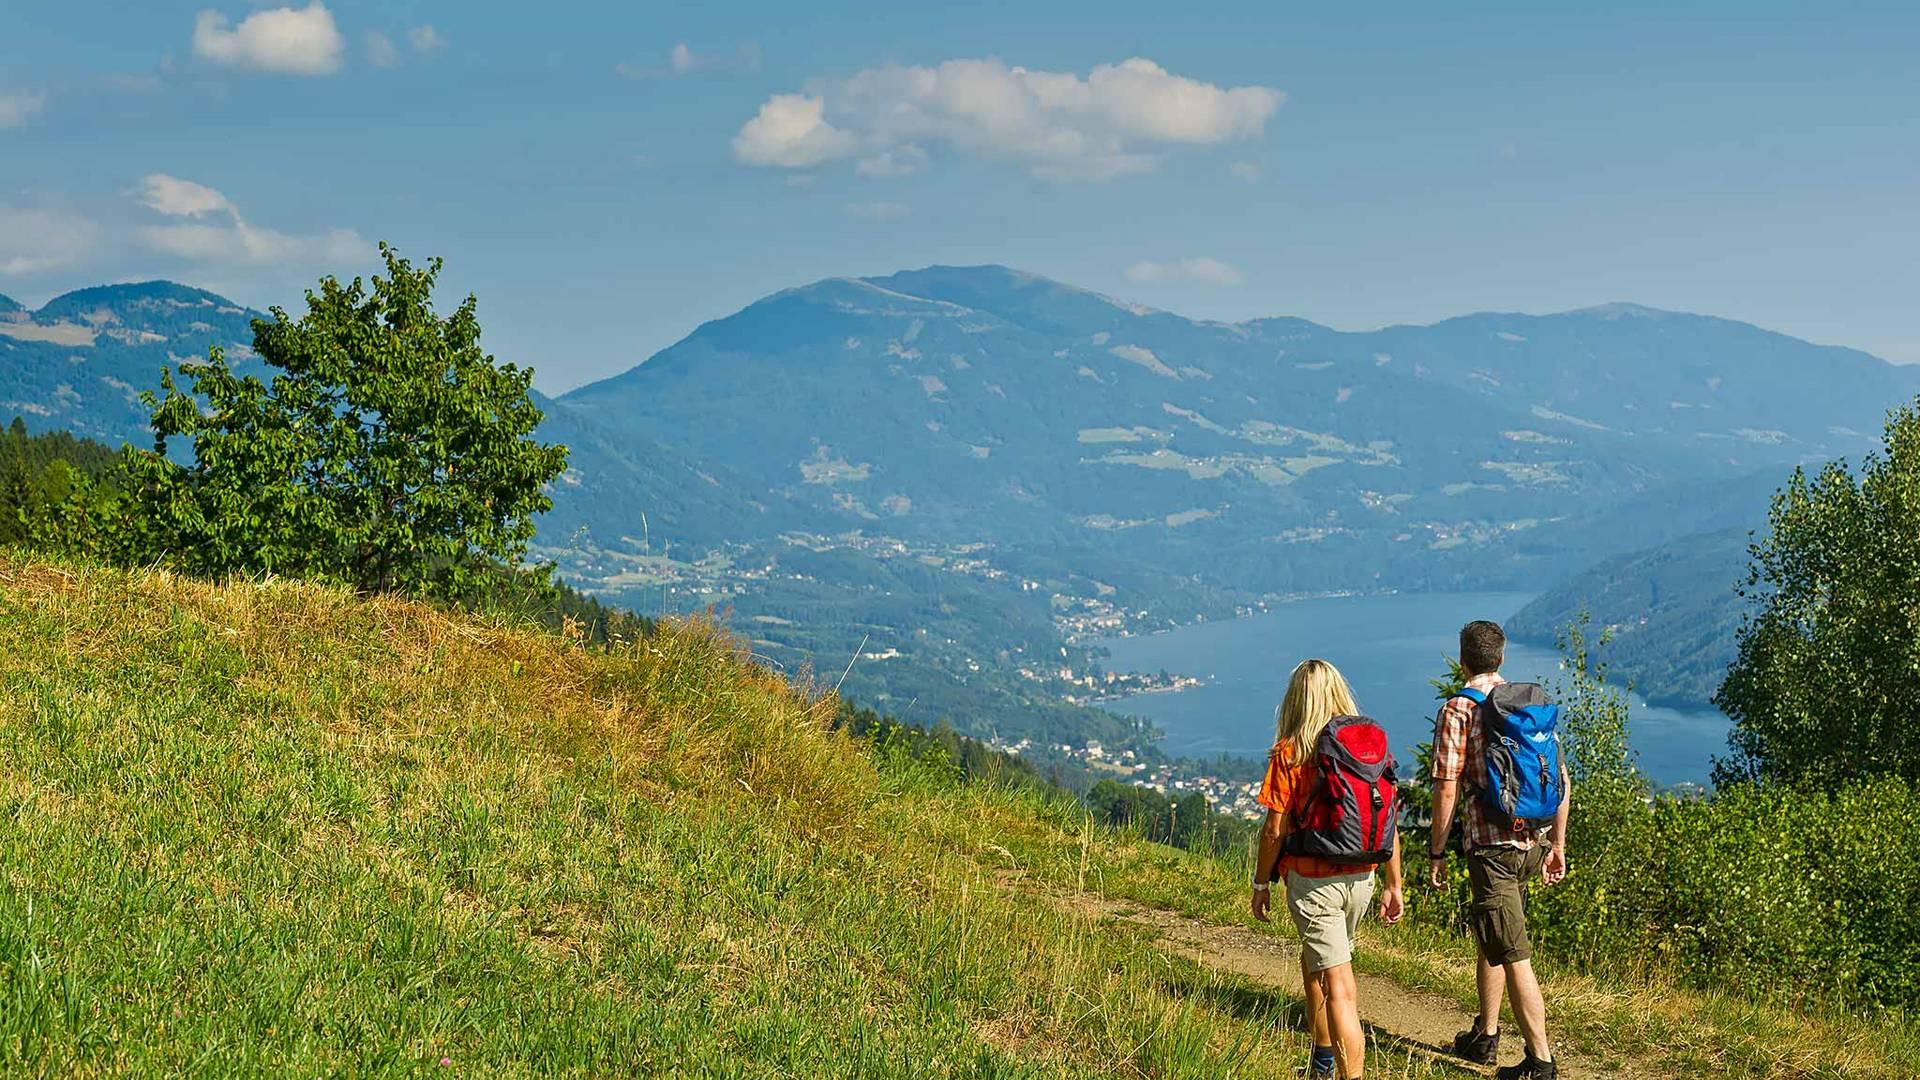 Alpe adria trail huhnersberg original